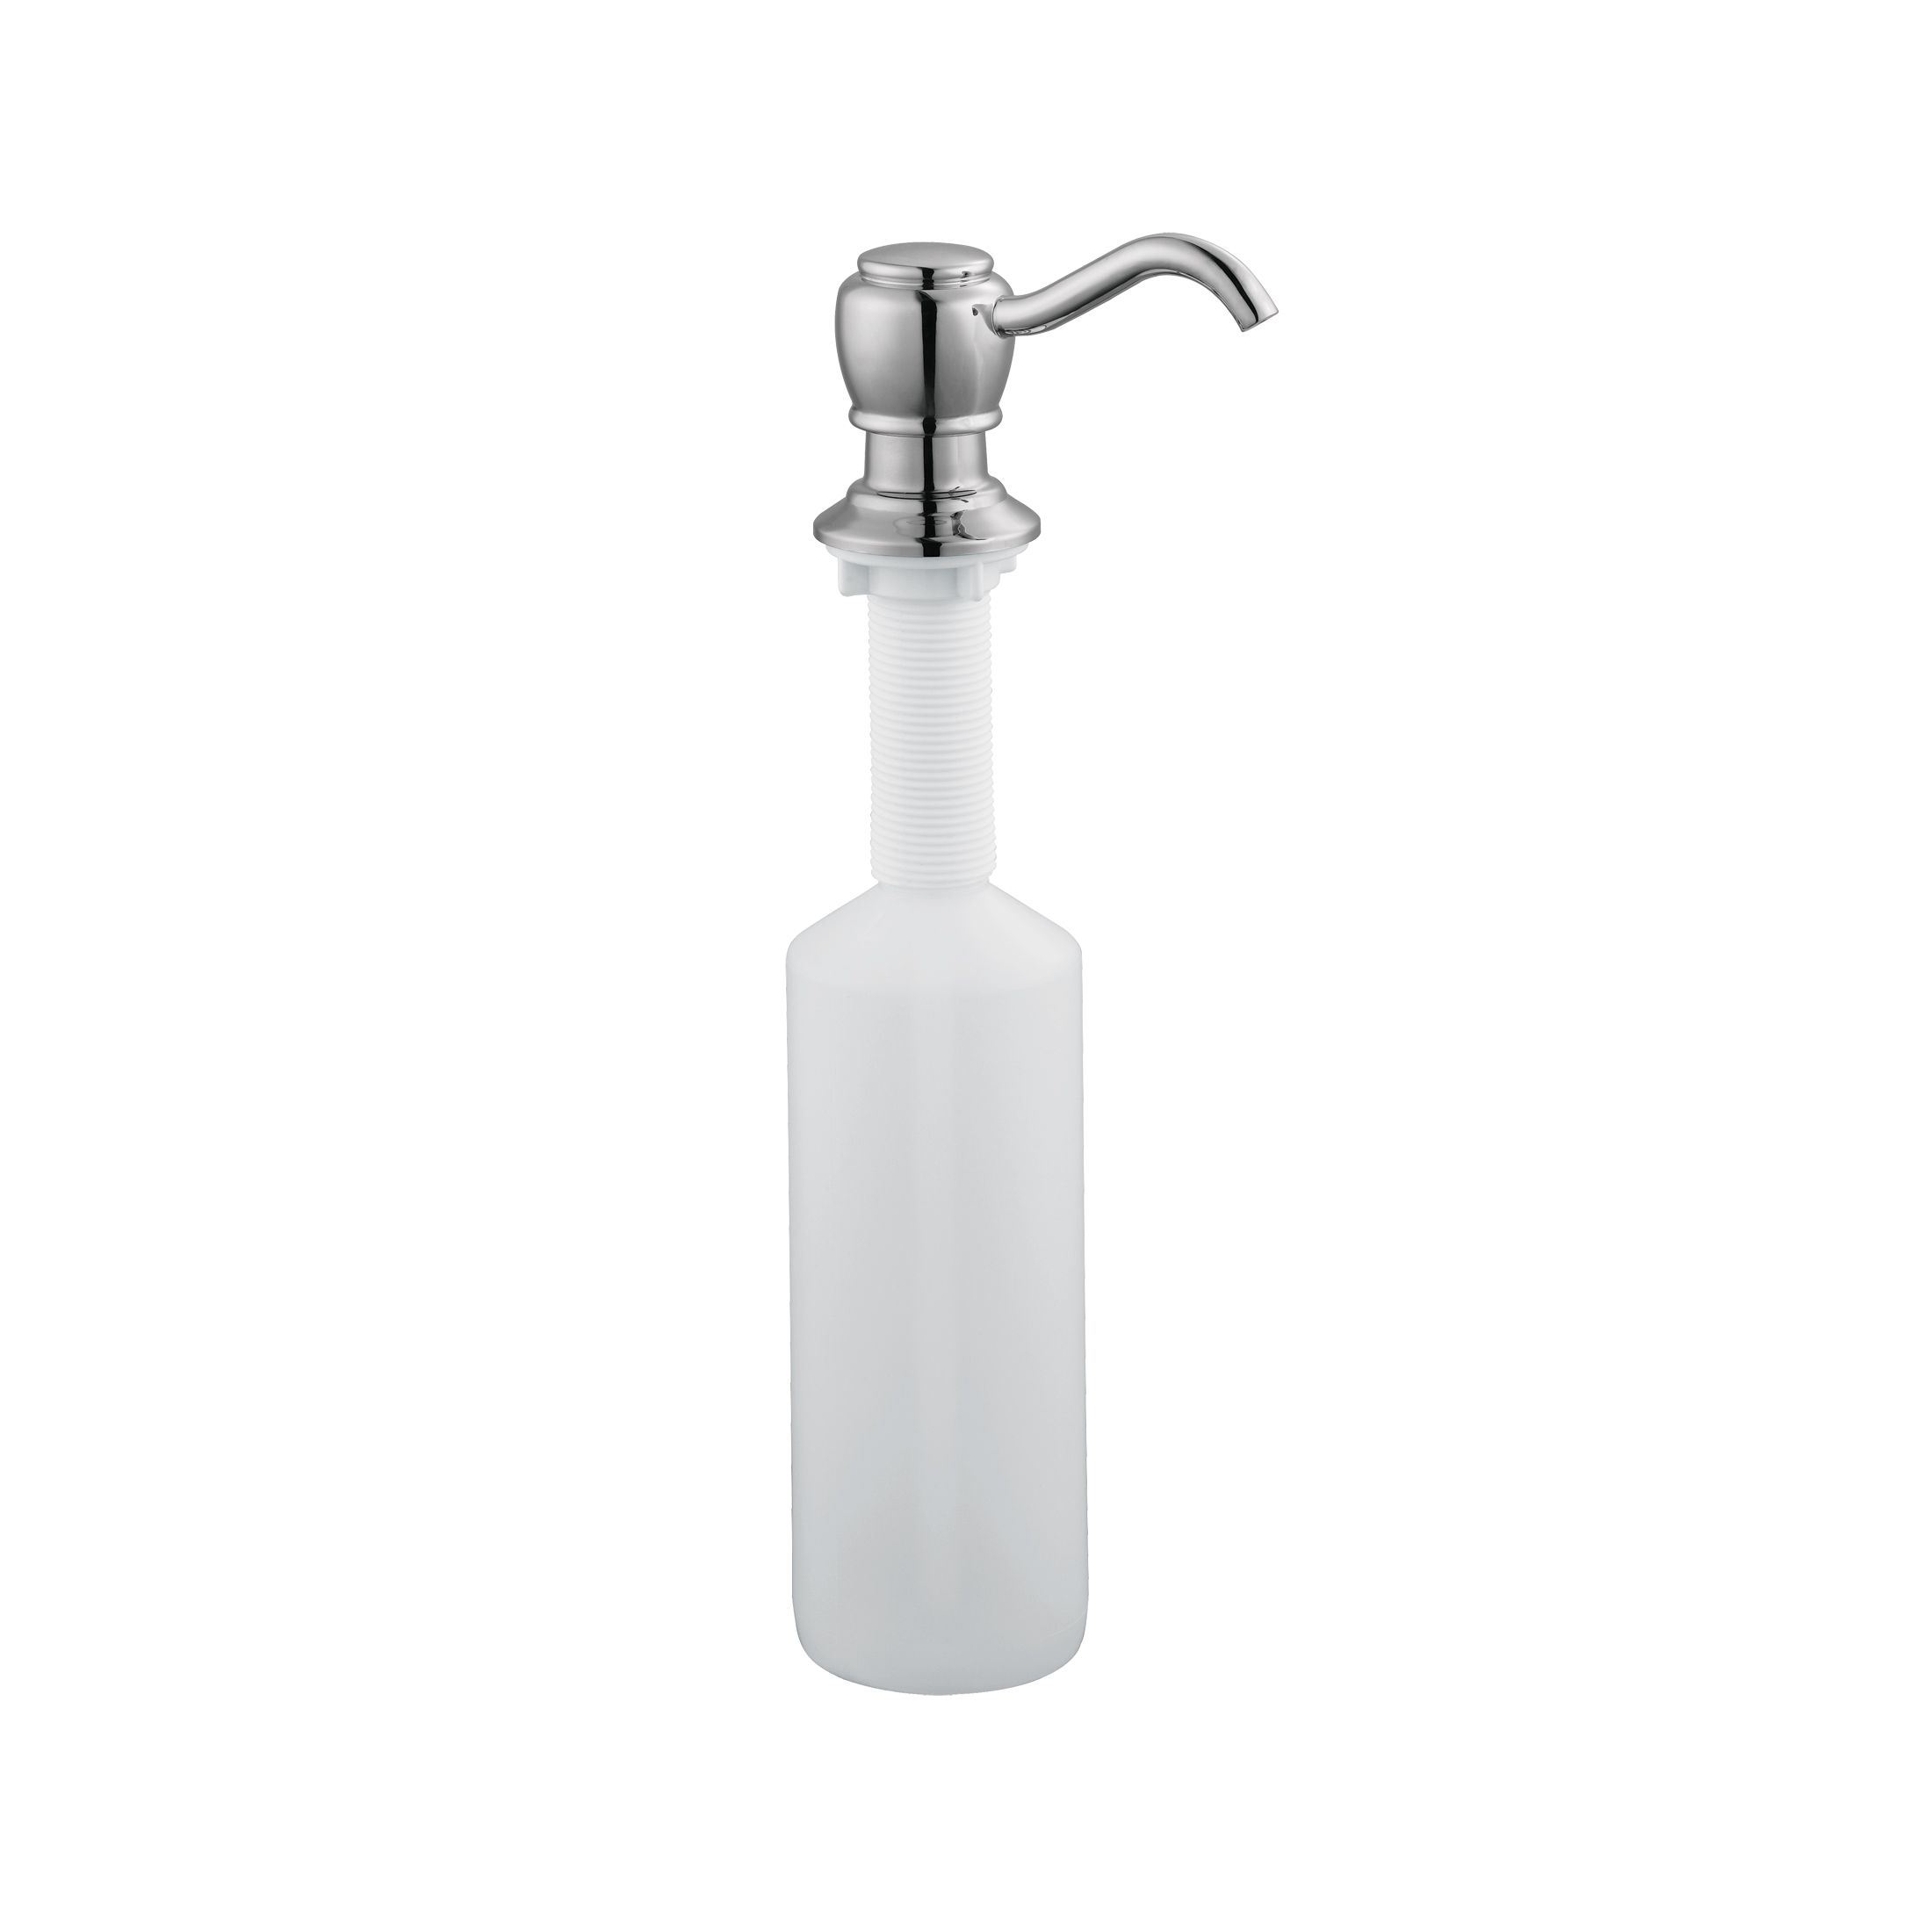 Soap Dispenser, Polished Chrome #522243